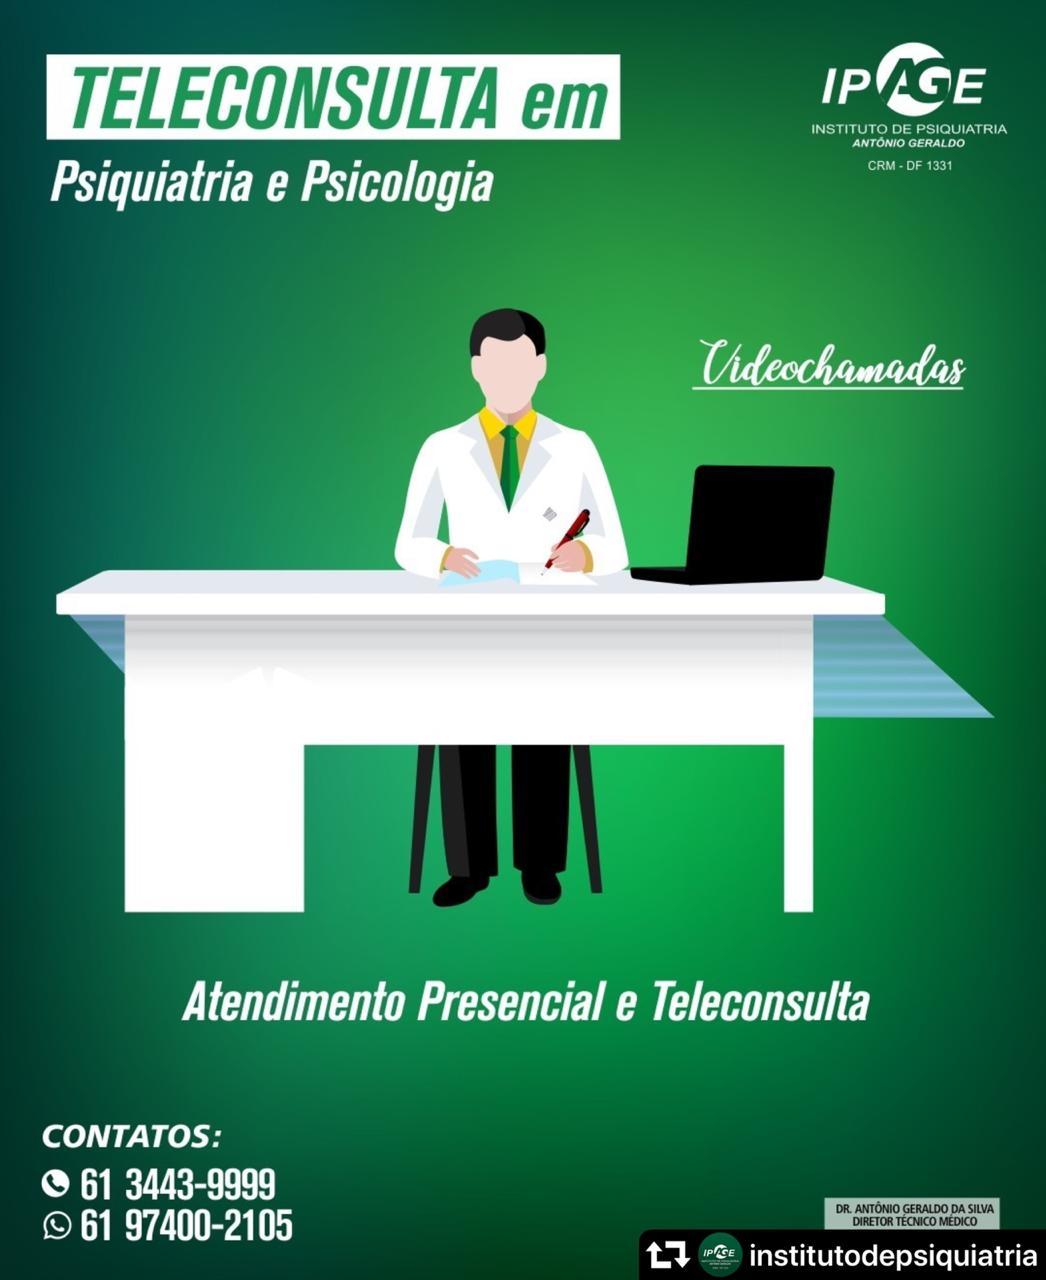 teleconsulta ipage psiquiatra brasilia